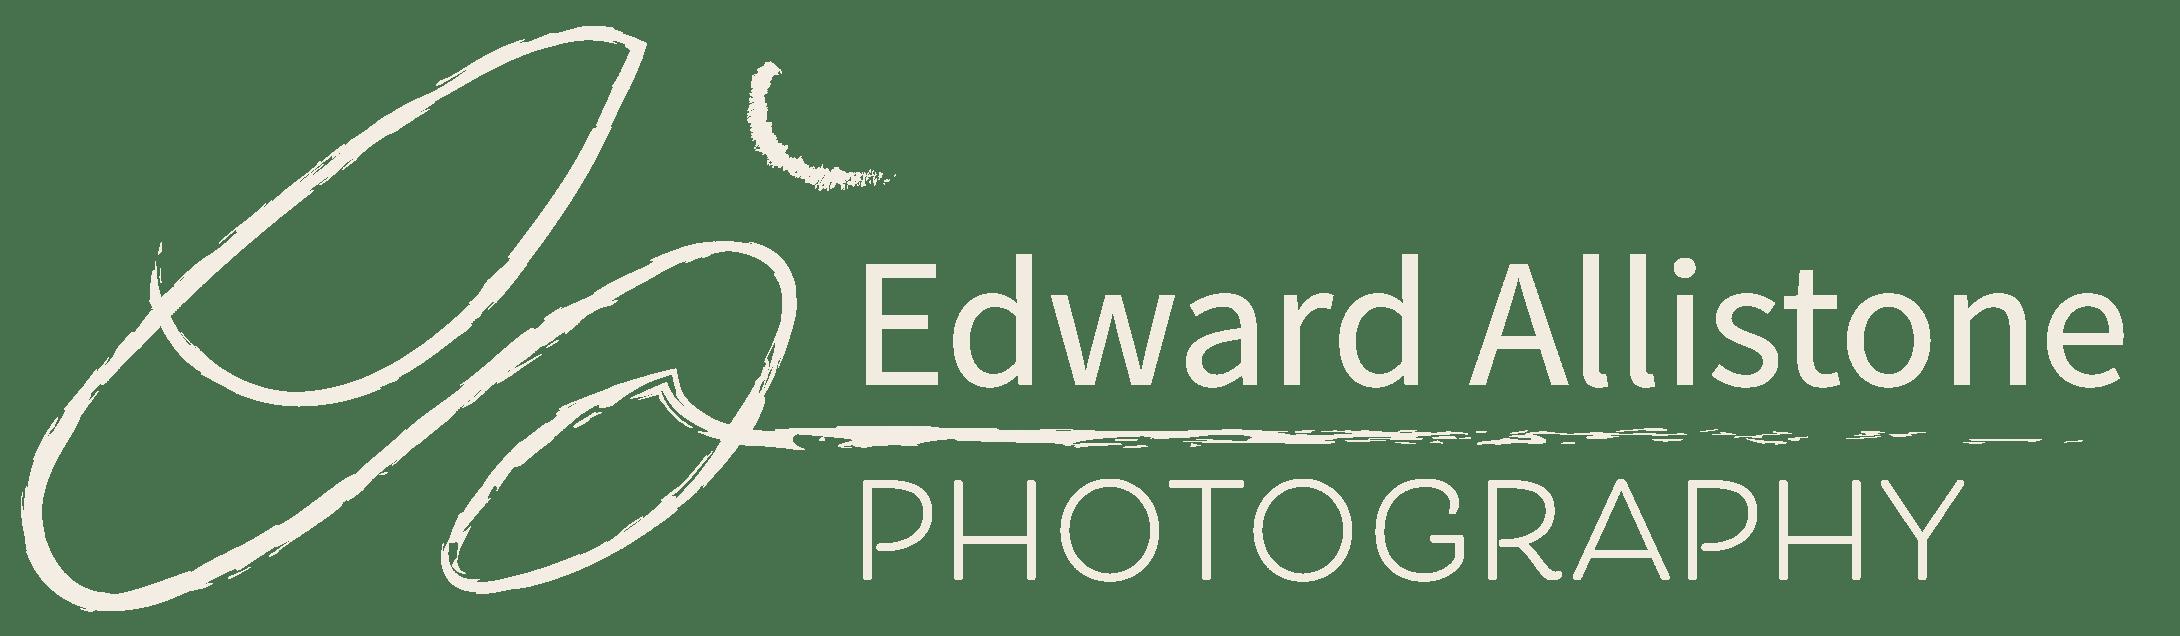 UK Landscape Photography Prints